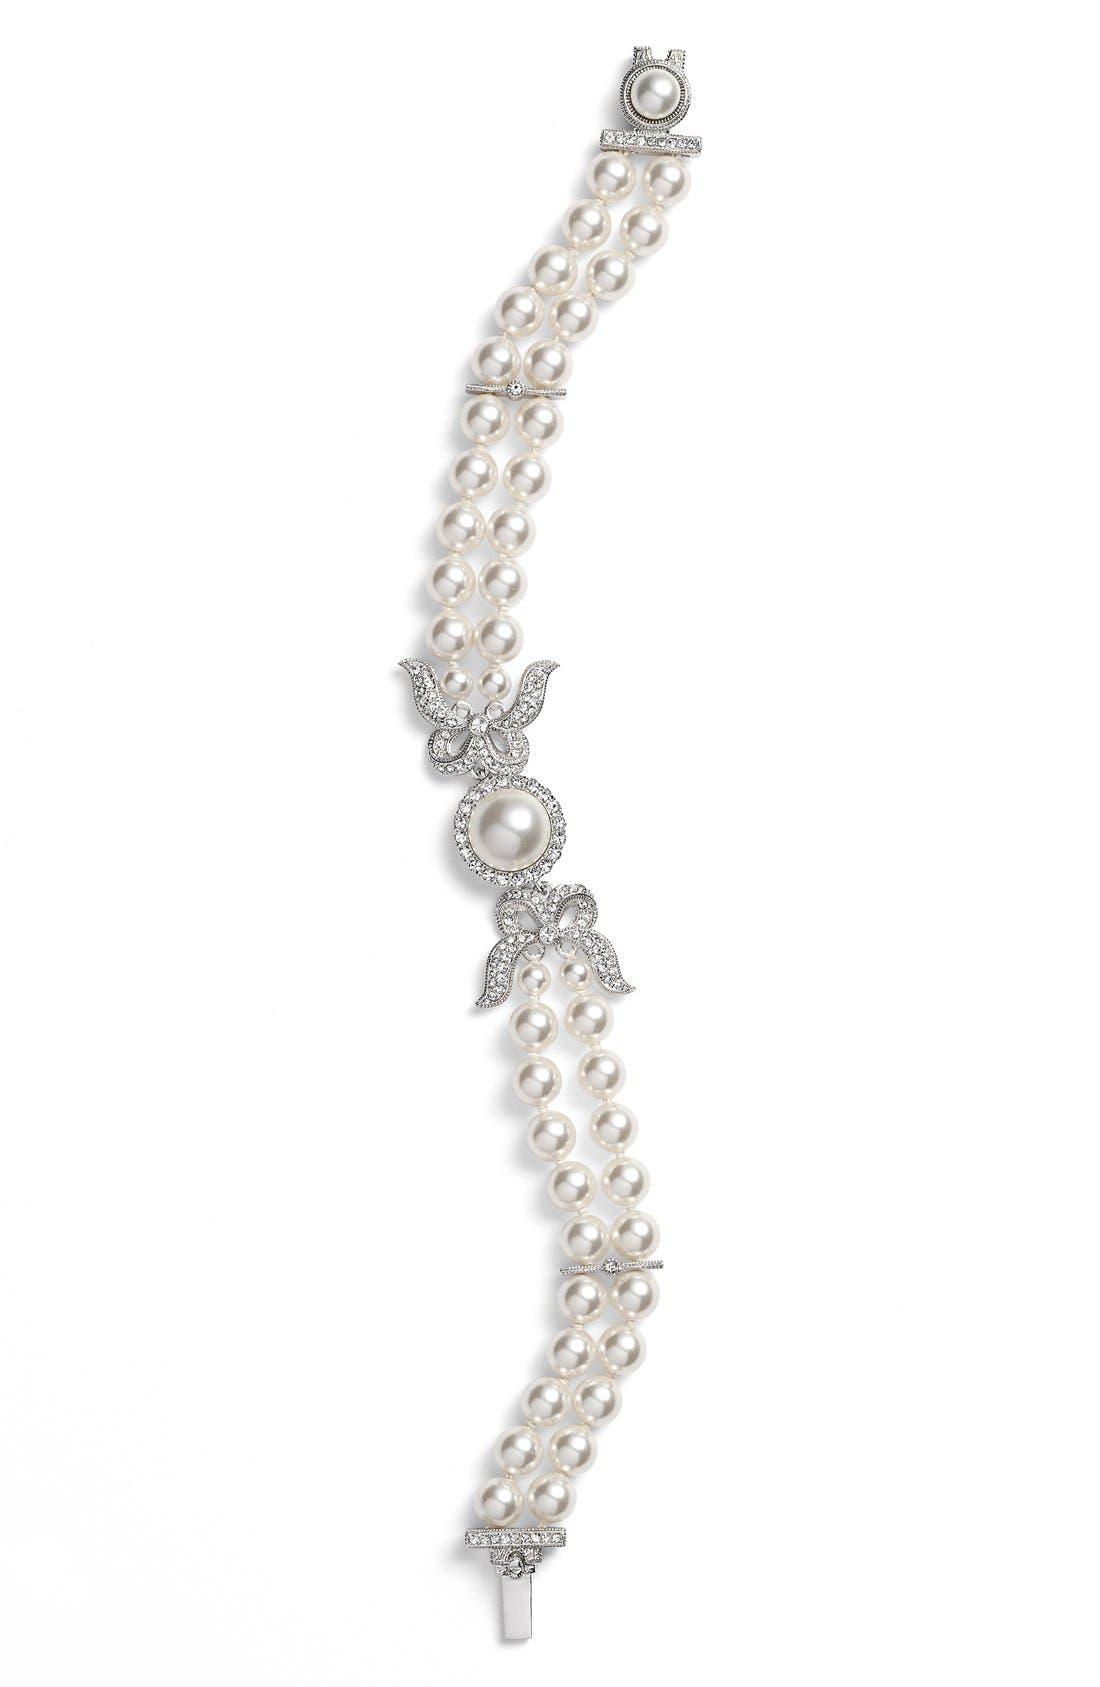 Main Image - Nadri Two Row Imitation Pearl & Crystal Bracelet